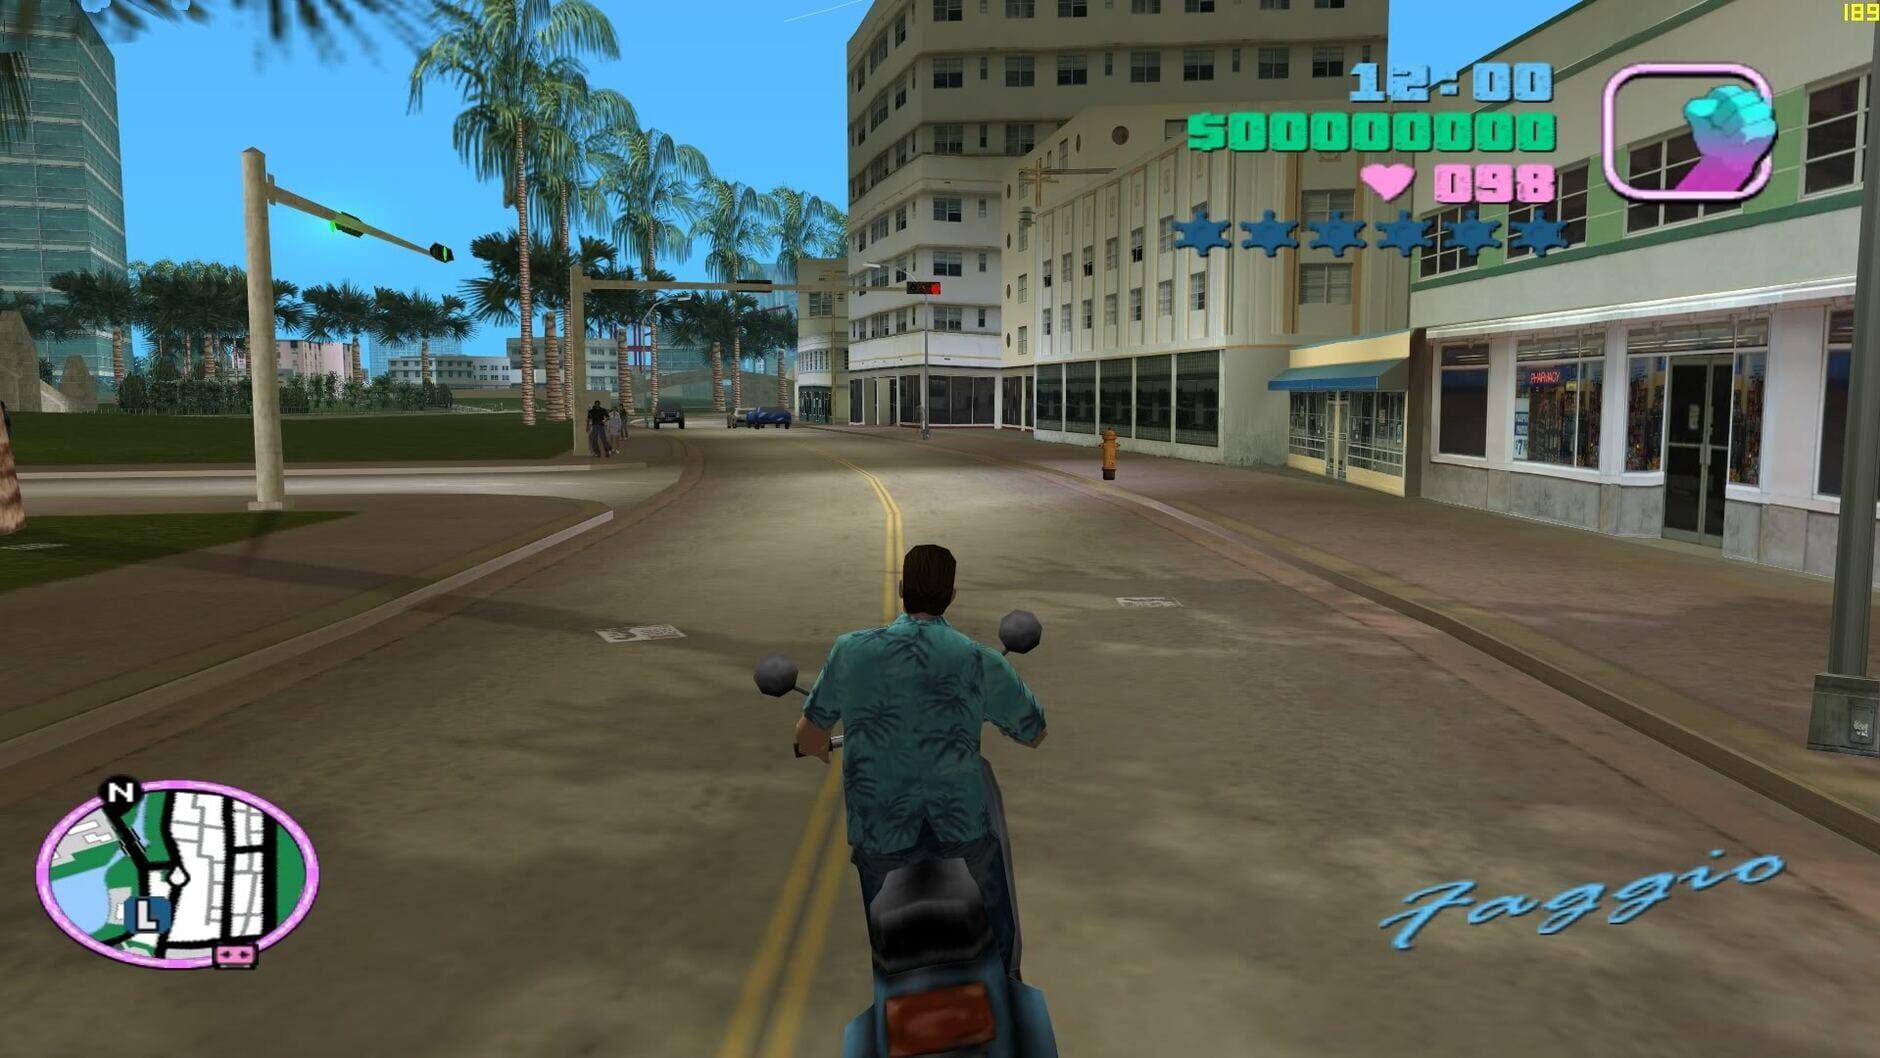 Grand Theft Auto: Vice City - 1